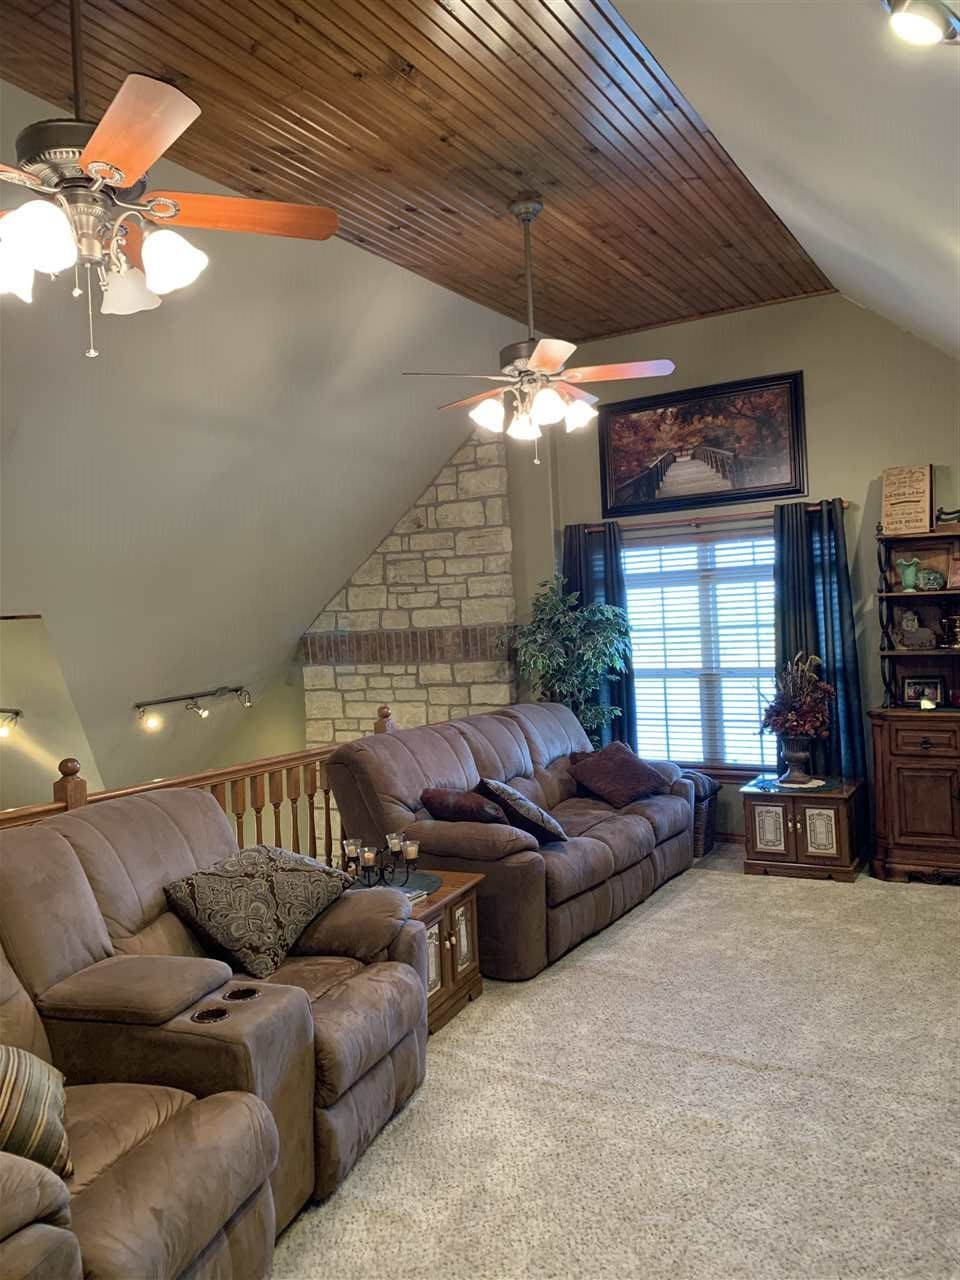 #century21groupone,#homesforsaleponcacity,#poncacityrealestate | 4251 N Union Ponca City, OK 74604 30